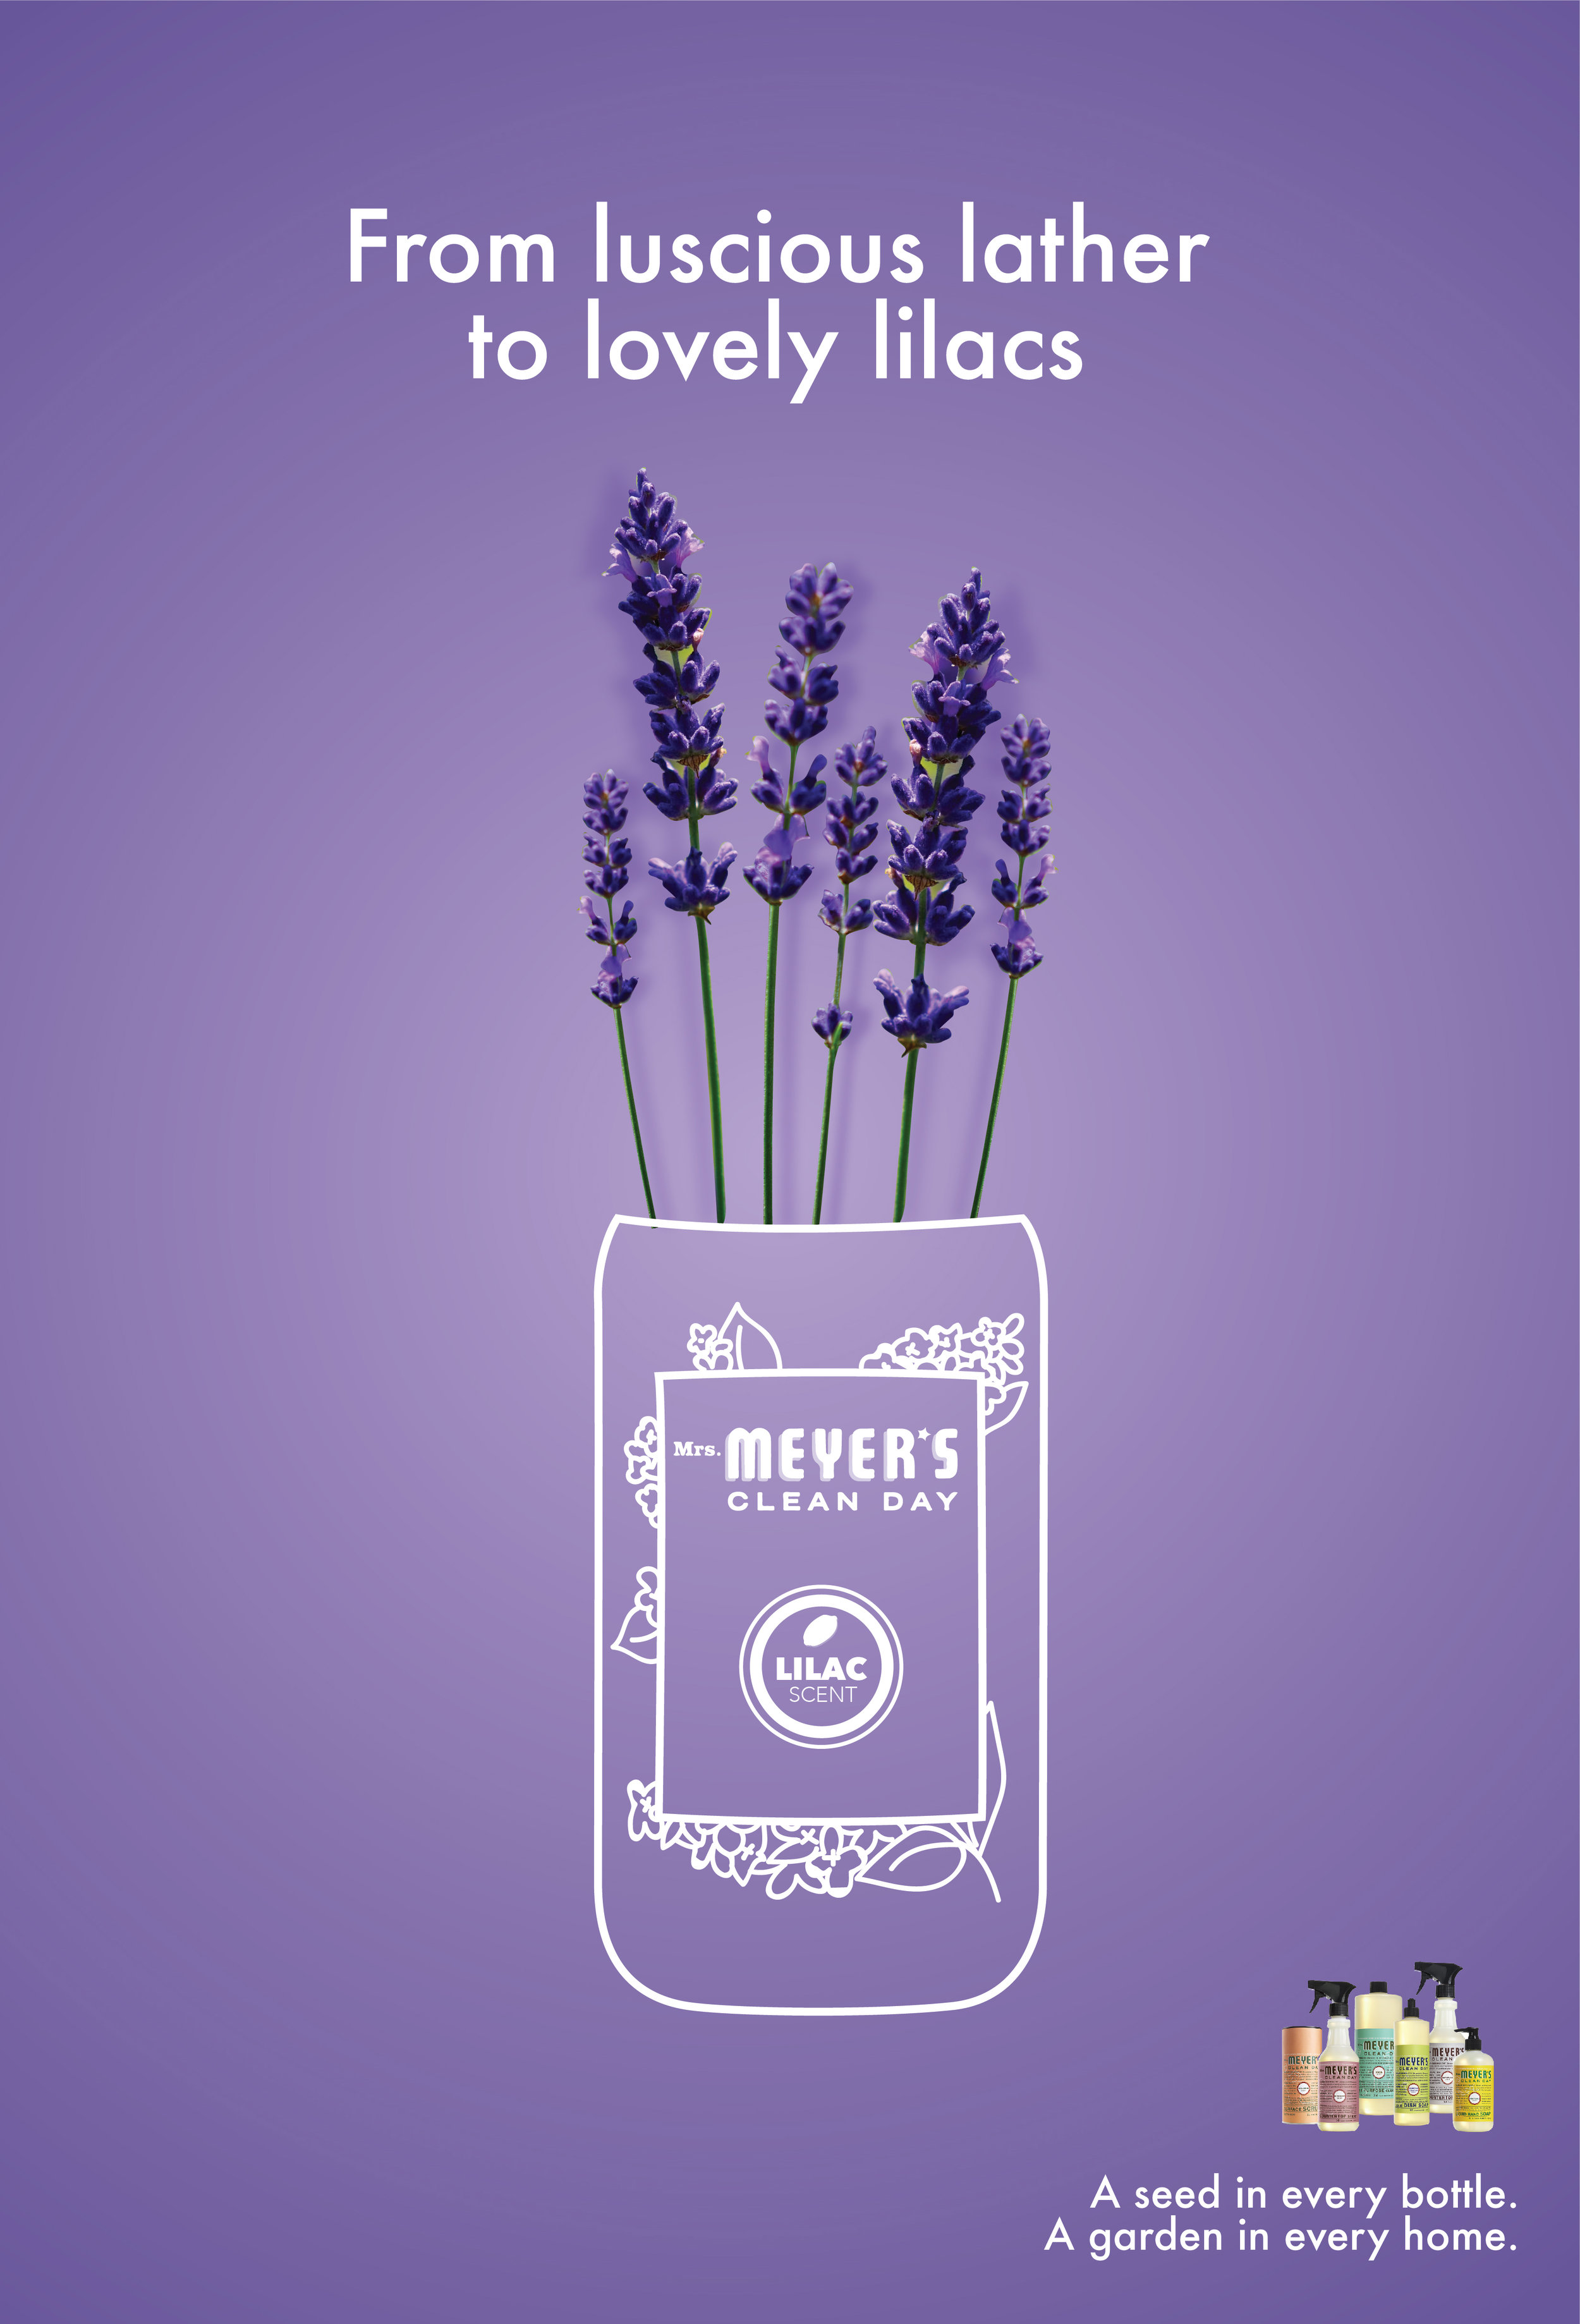 lilac copy.jpg